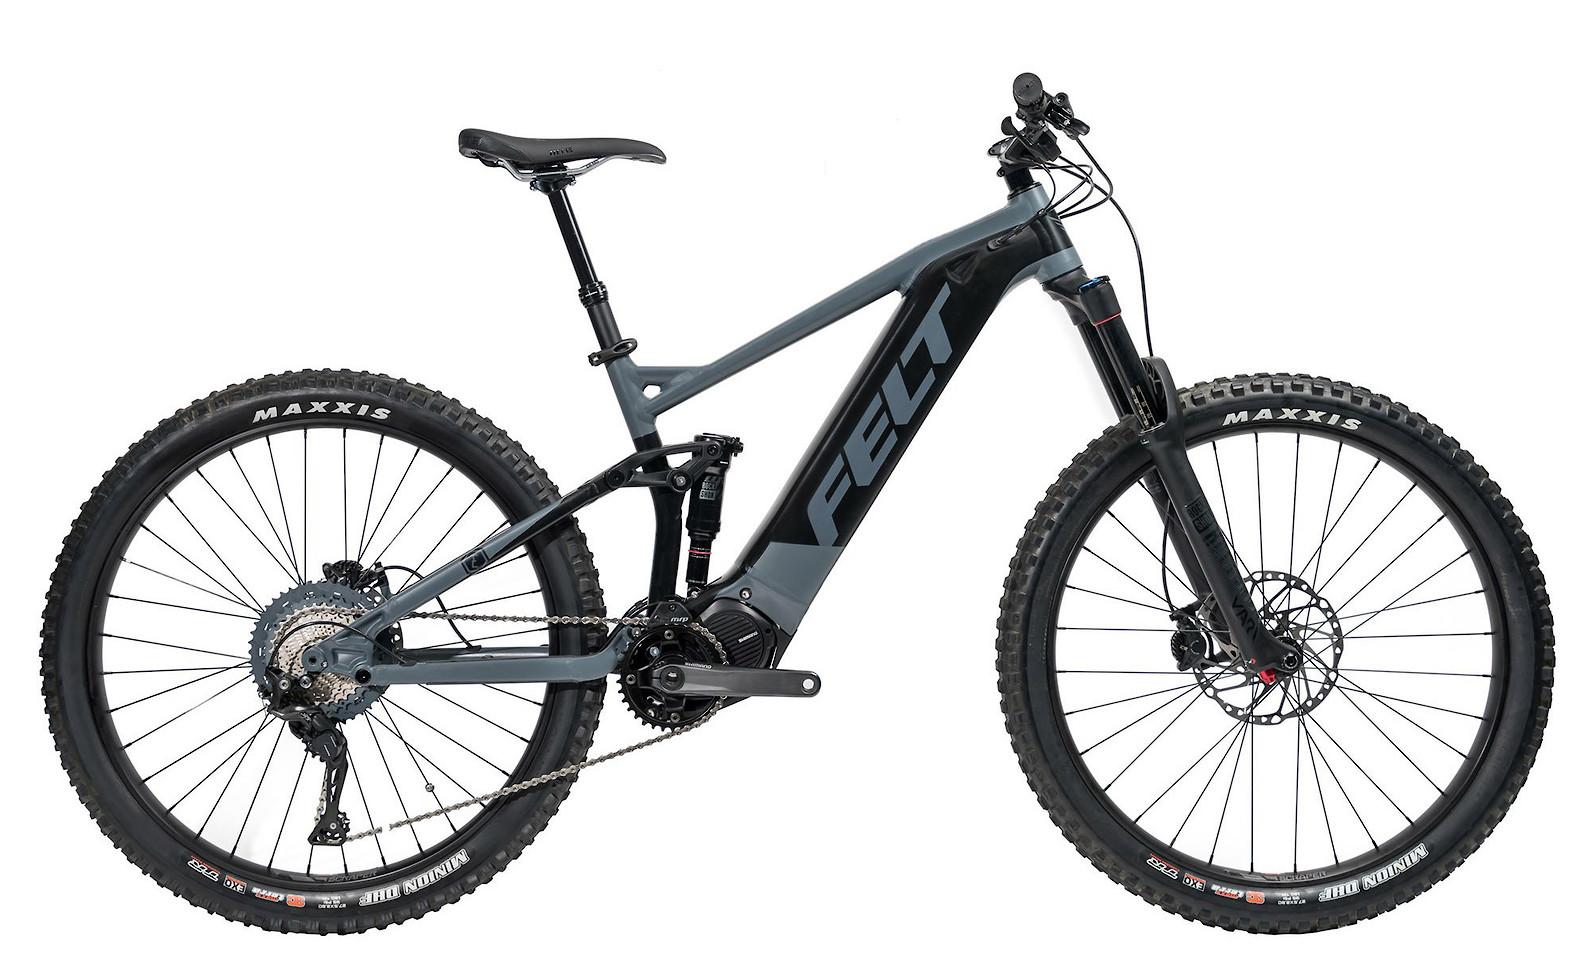 2019 Felt Redemption-E 50 E-Bike